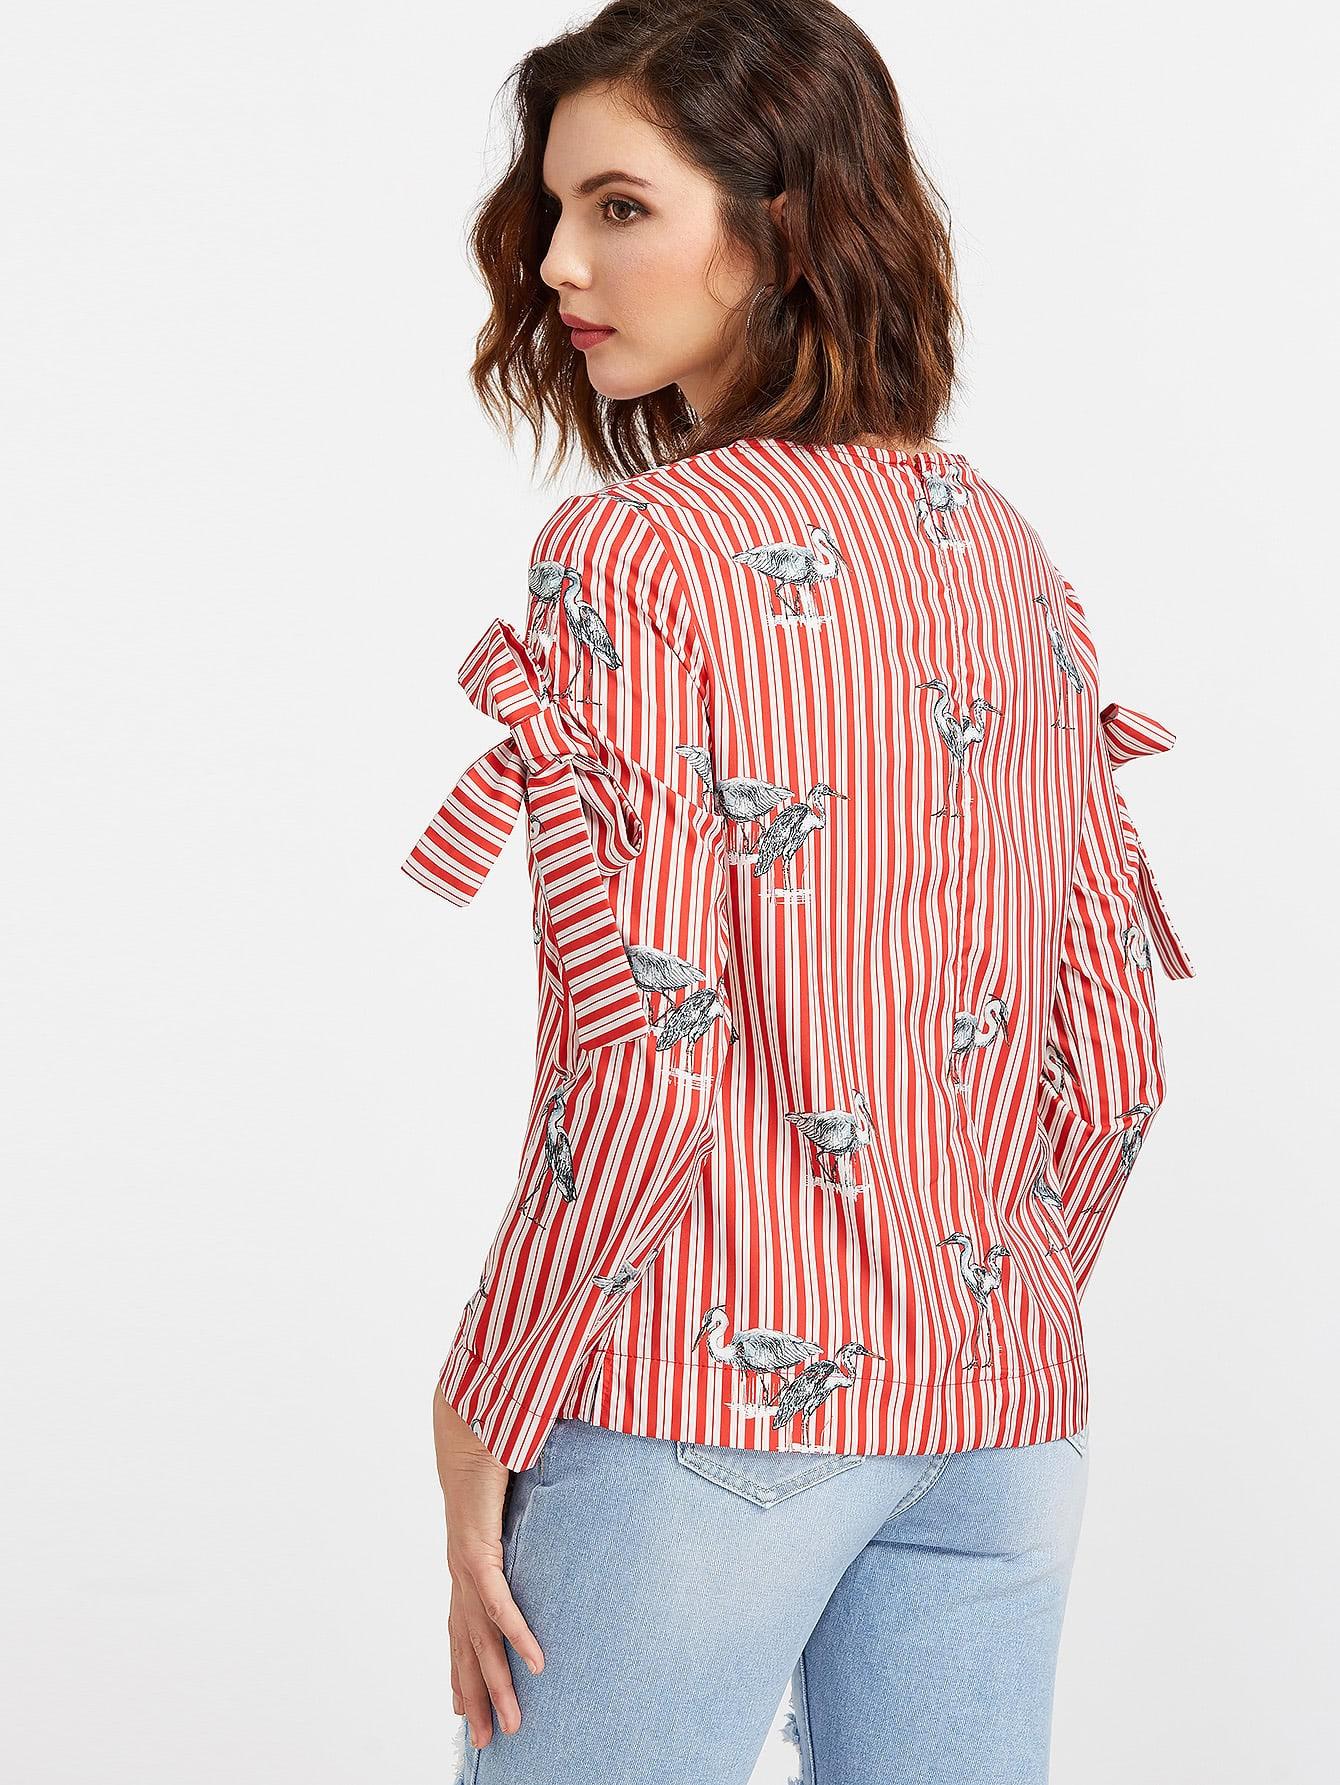 blouse170225202_2